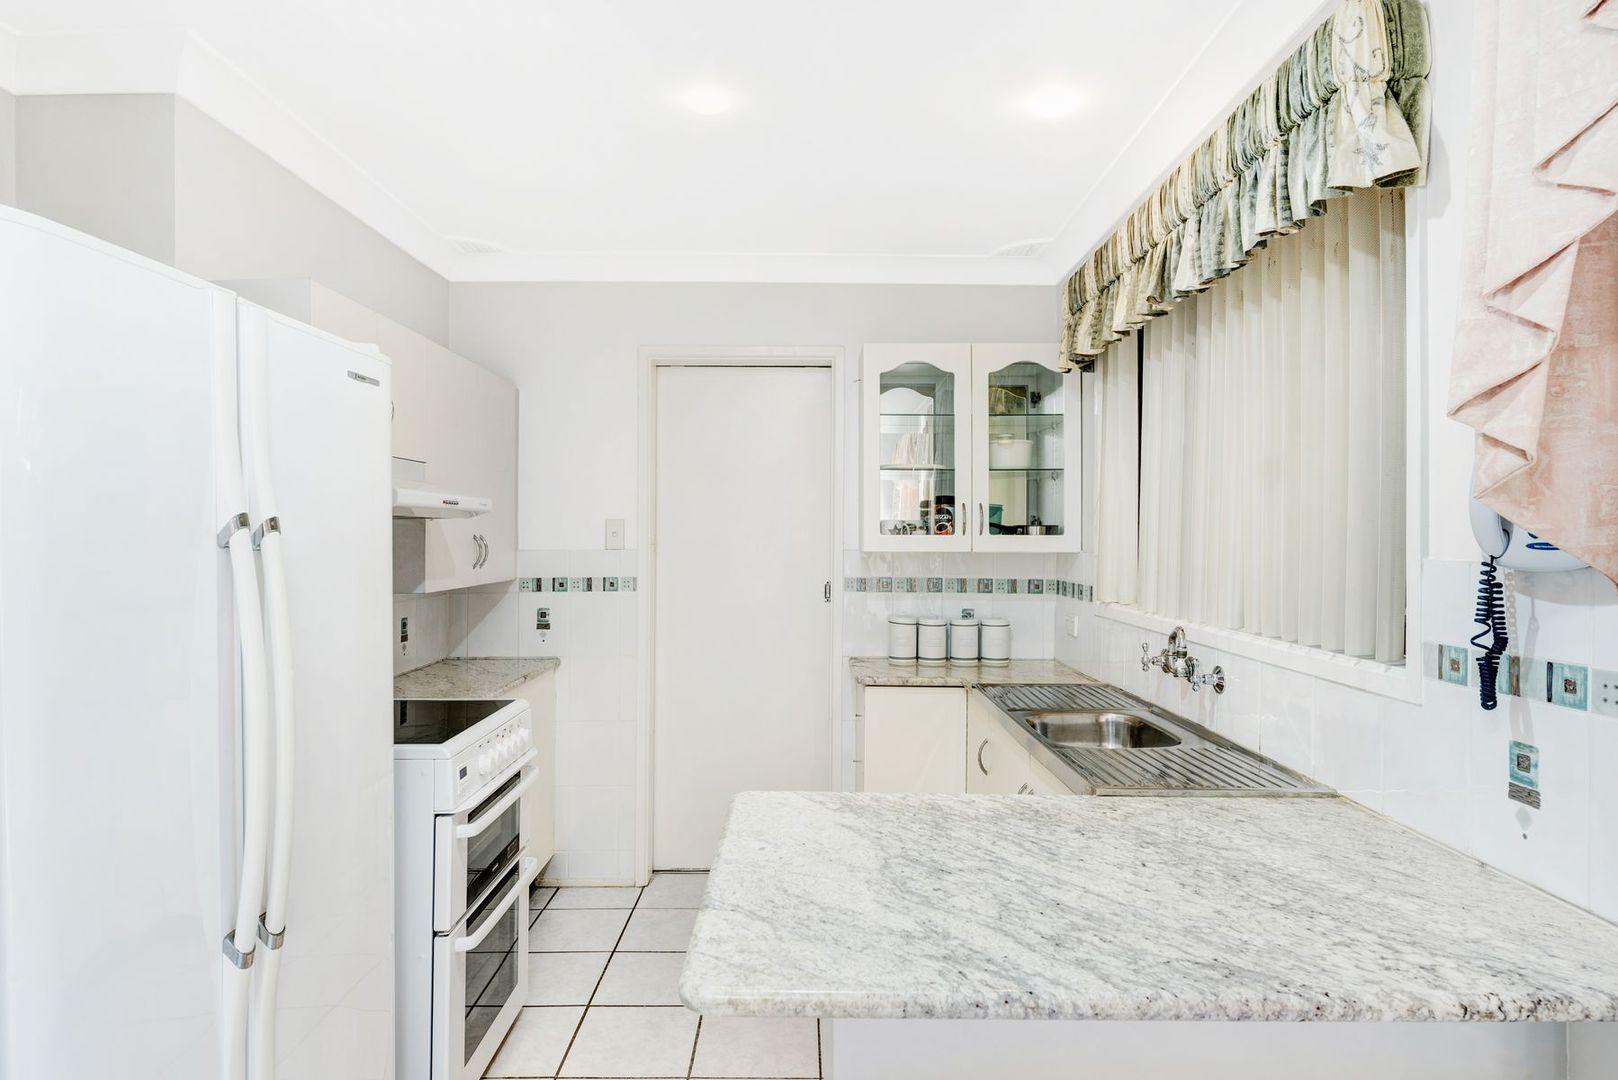 5/6-8 Centennial Avenue, Long Jetty NSW 2261, Image 1